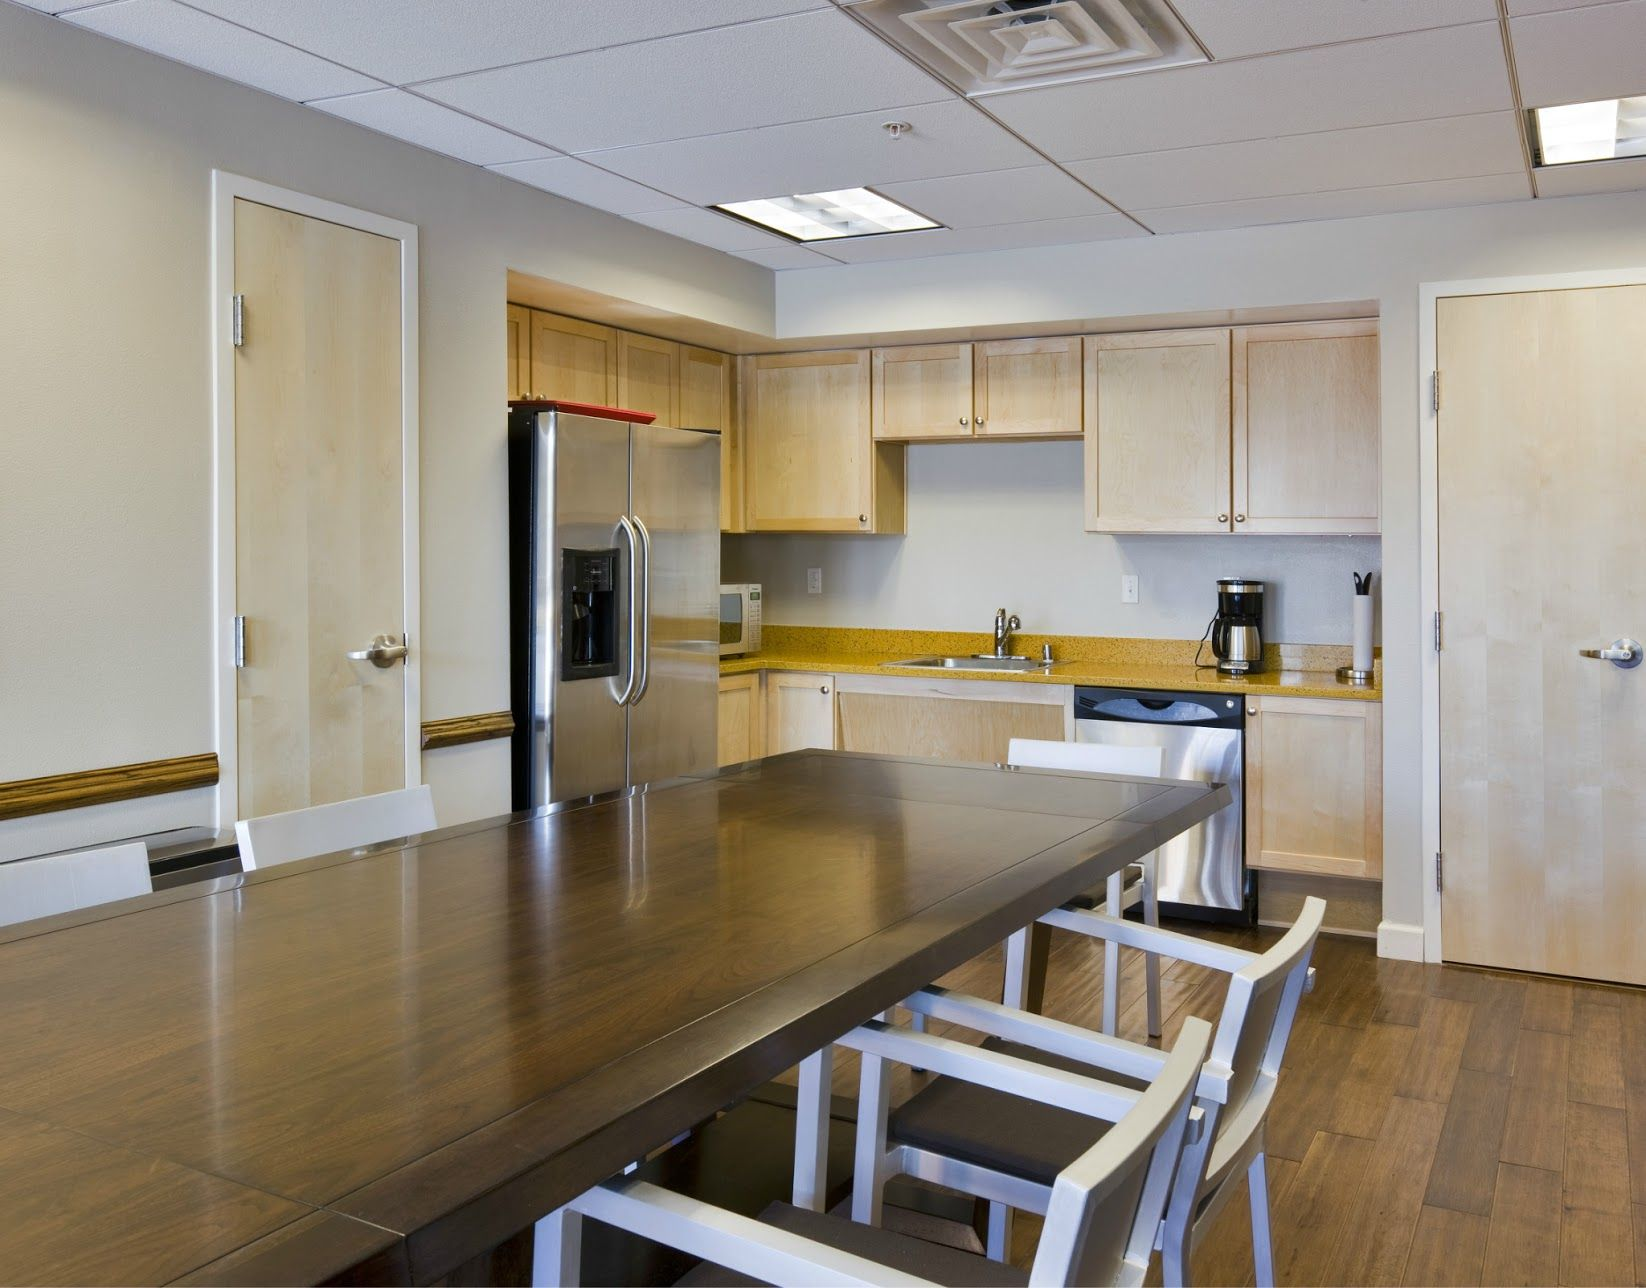 Silver Gardens Apartments (Albuquerque, NM) Apartment